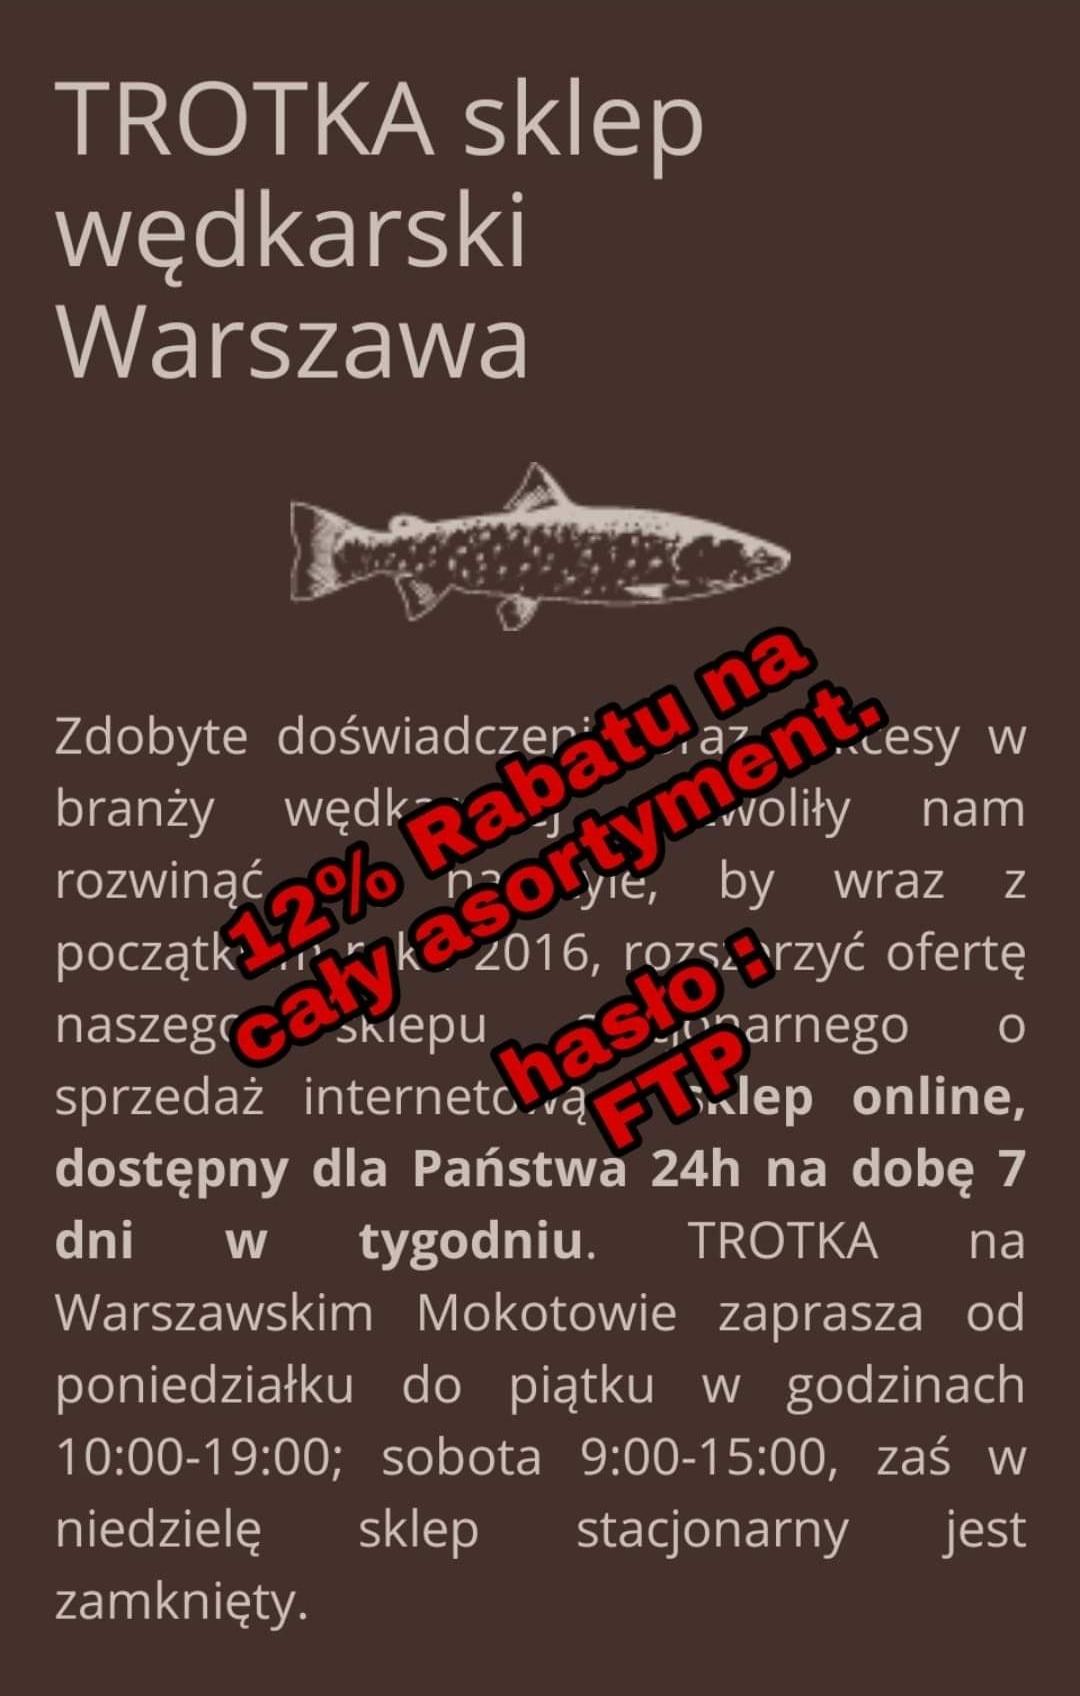 -12% CALY ASORTYMENT WĘDKARSKI TROTKA https://sklep-wedkarski.waw.pl/